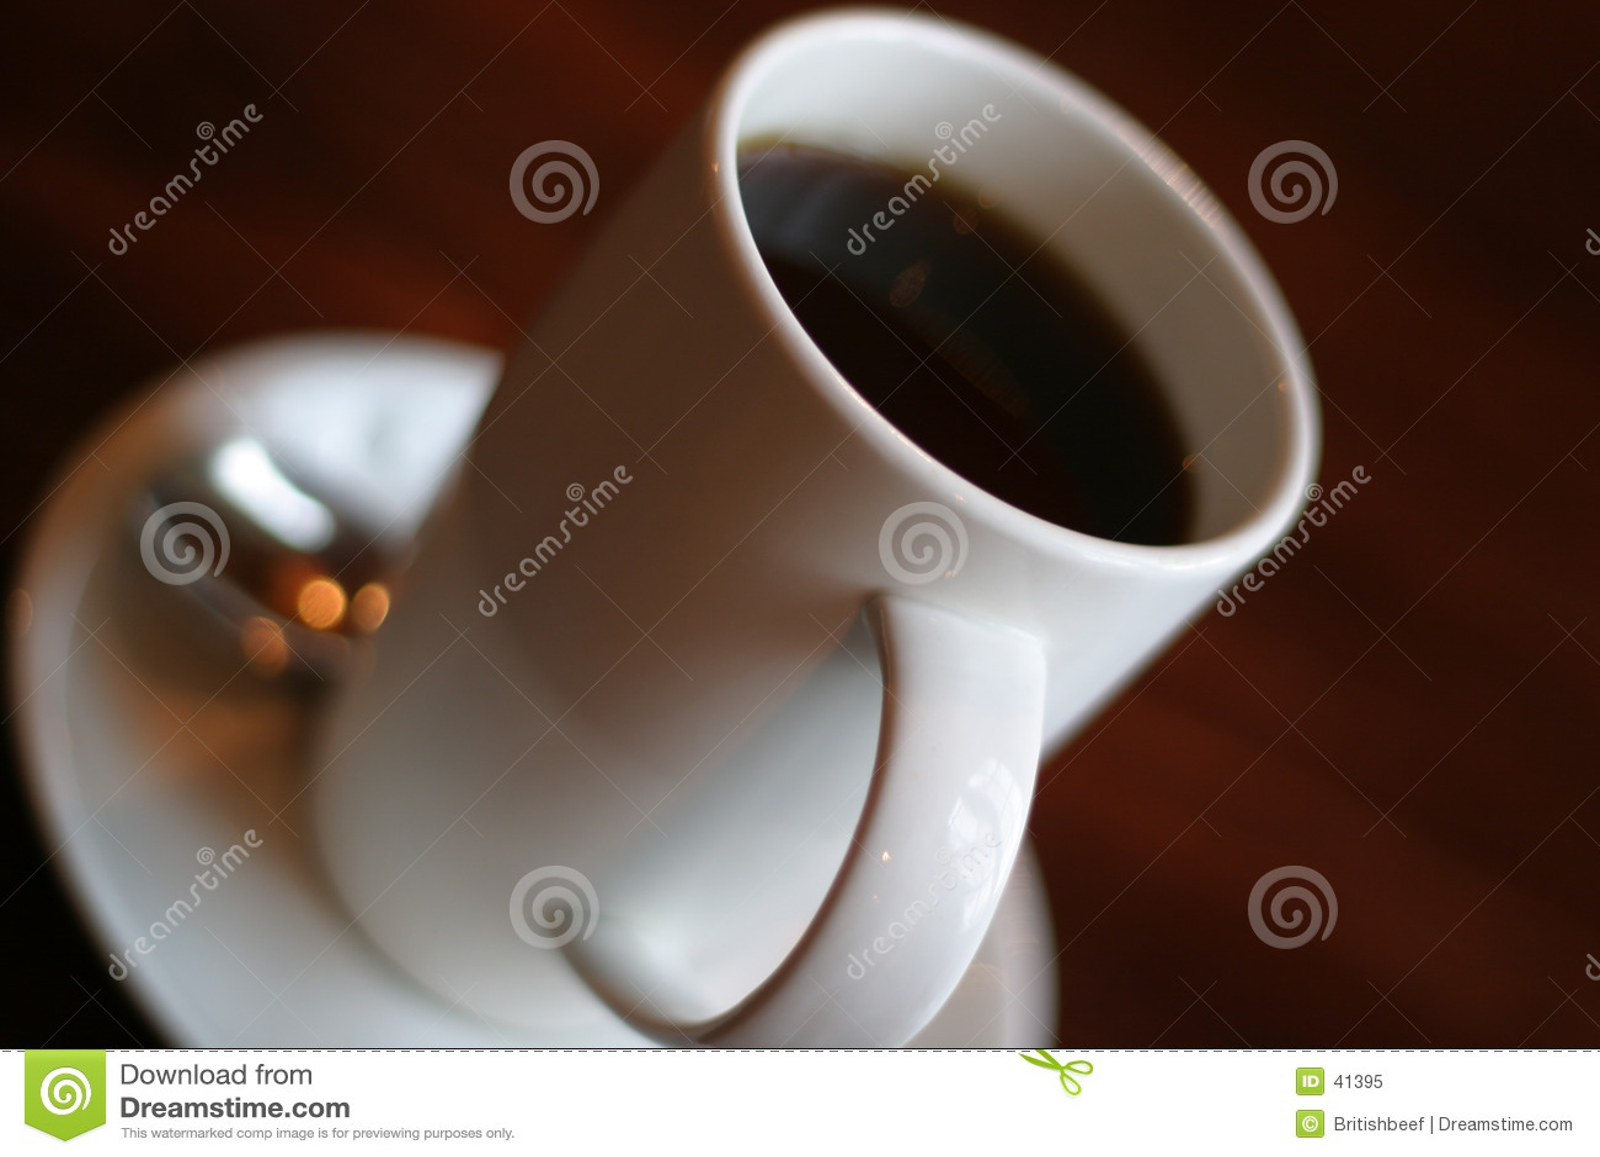 Download Descanso para tomar café imagen de archivo. Imagen de descafeinado - 41395